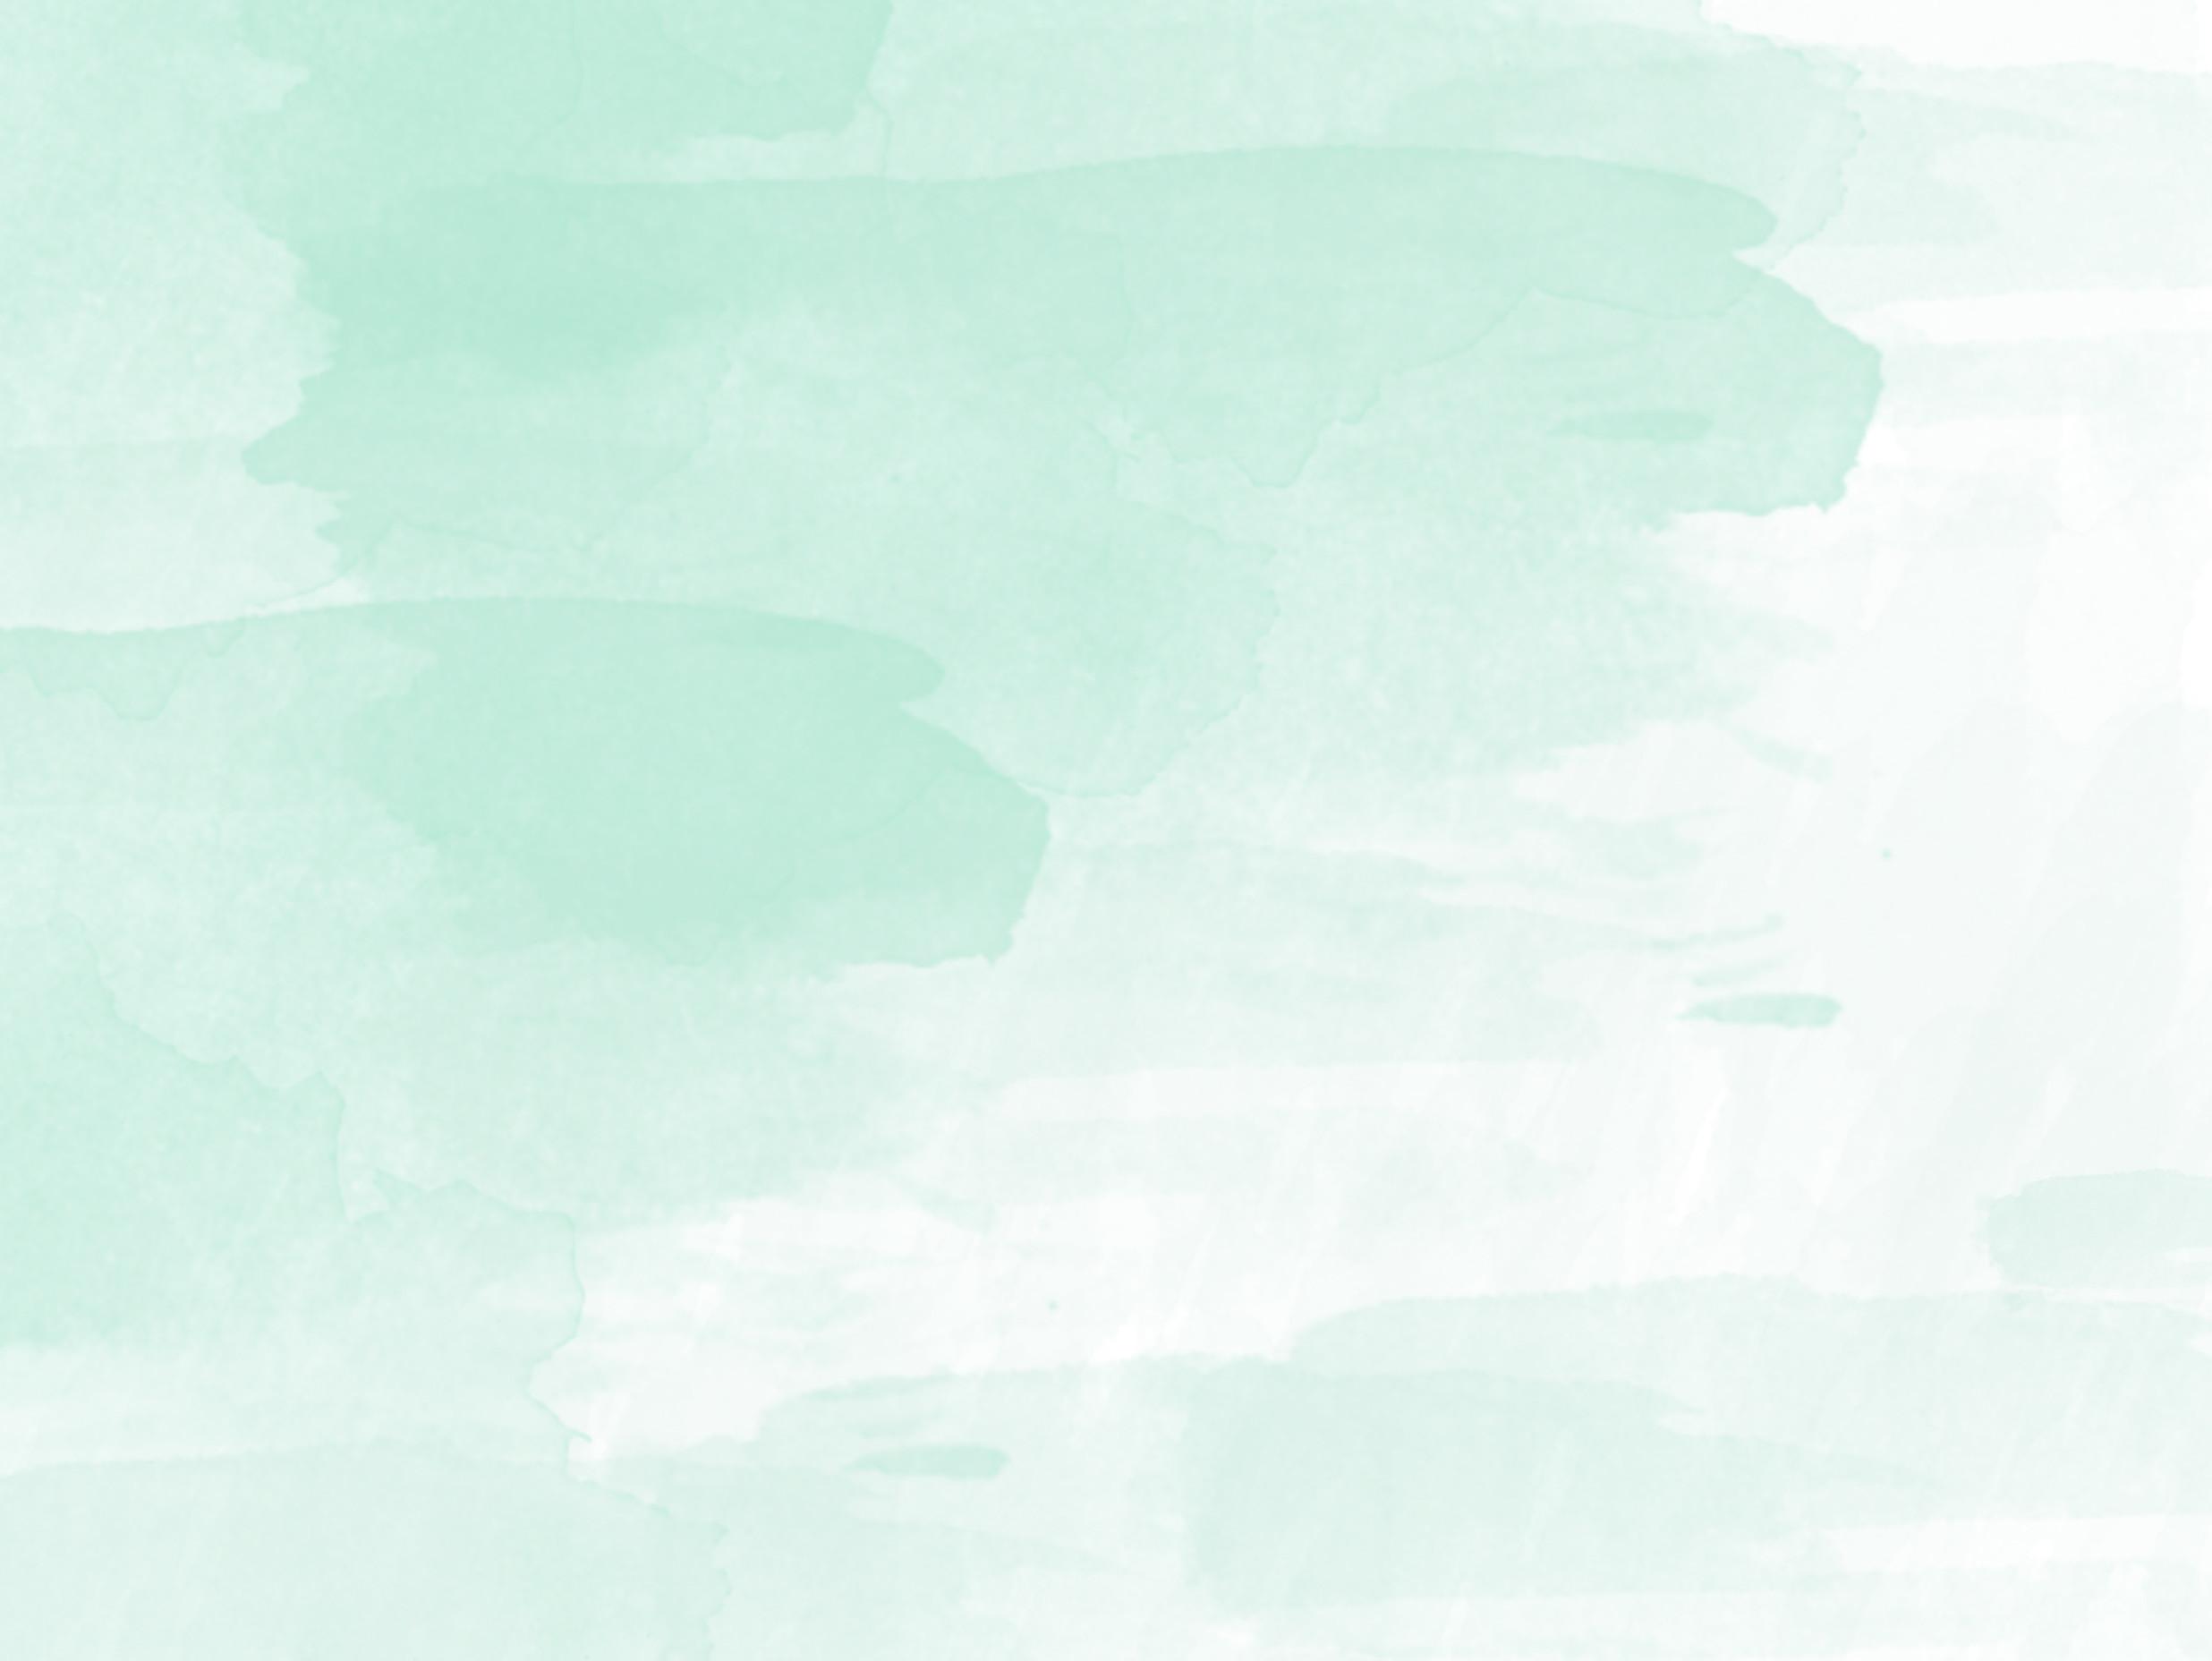 Mint Green iPhone Wallpaper (60+ images)